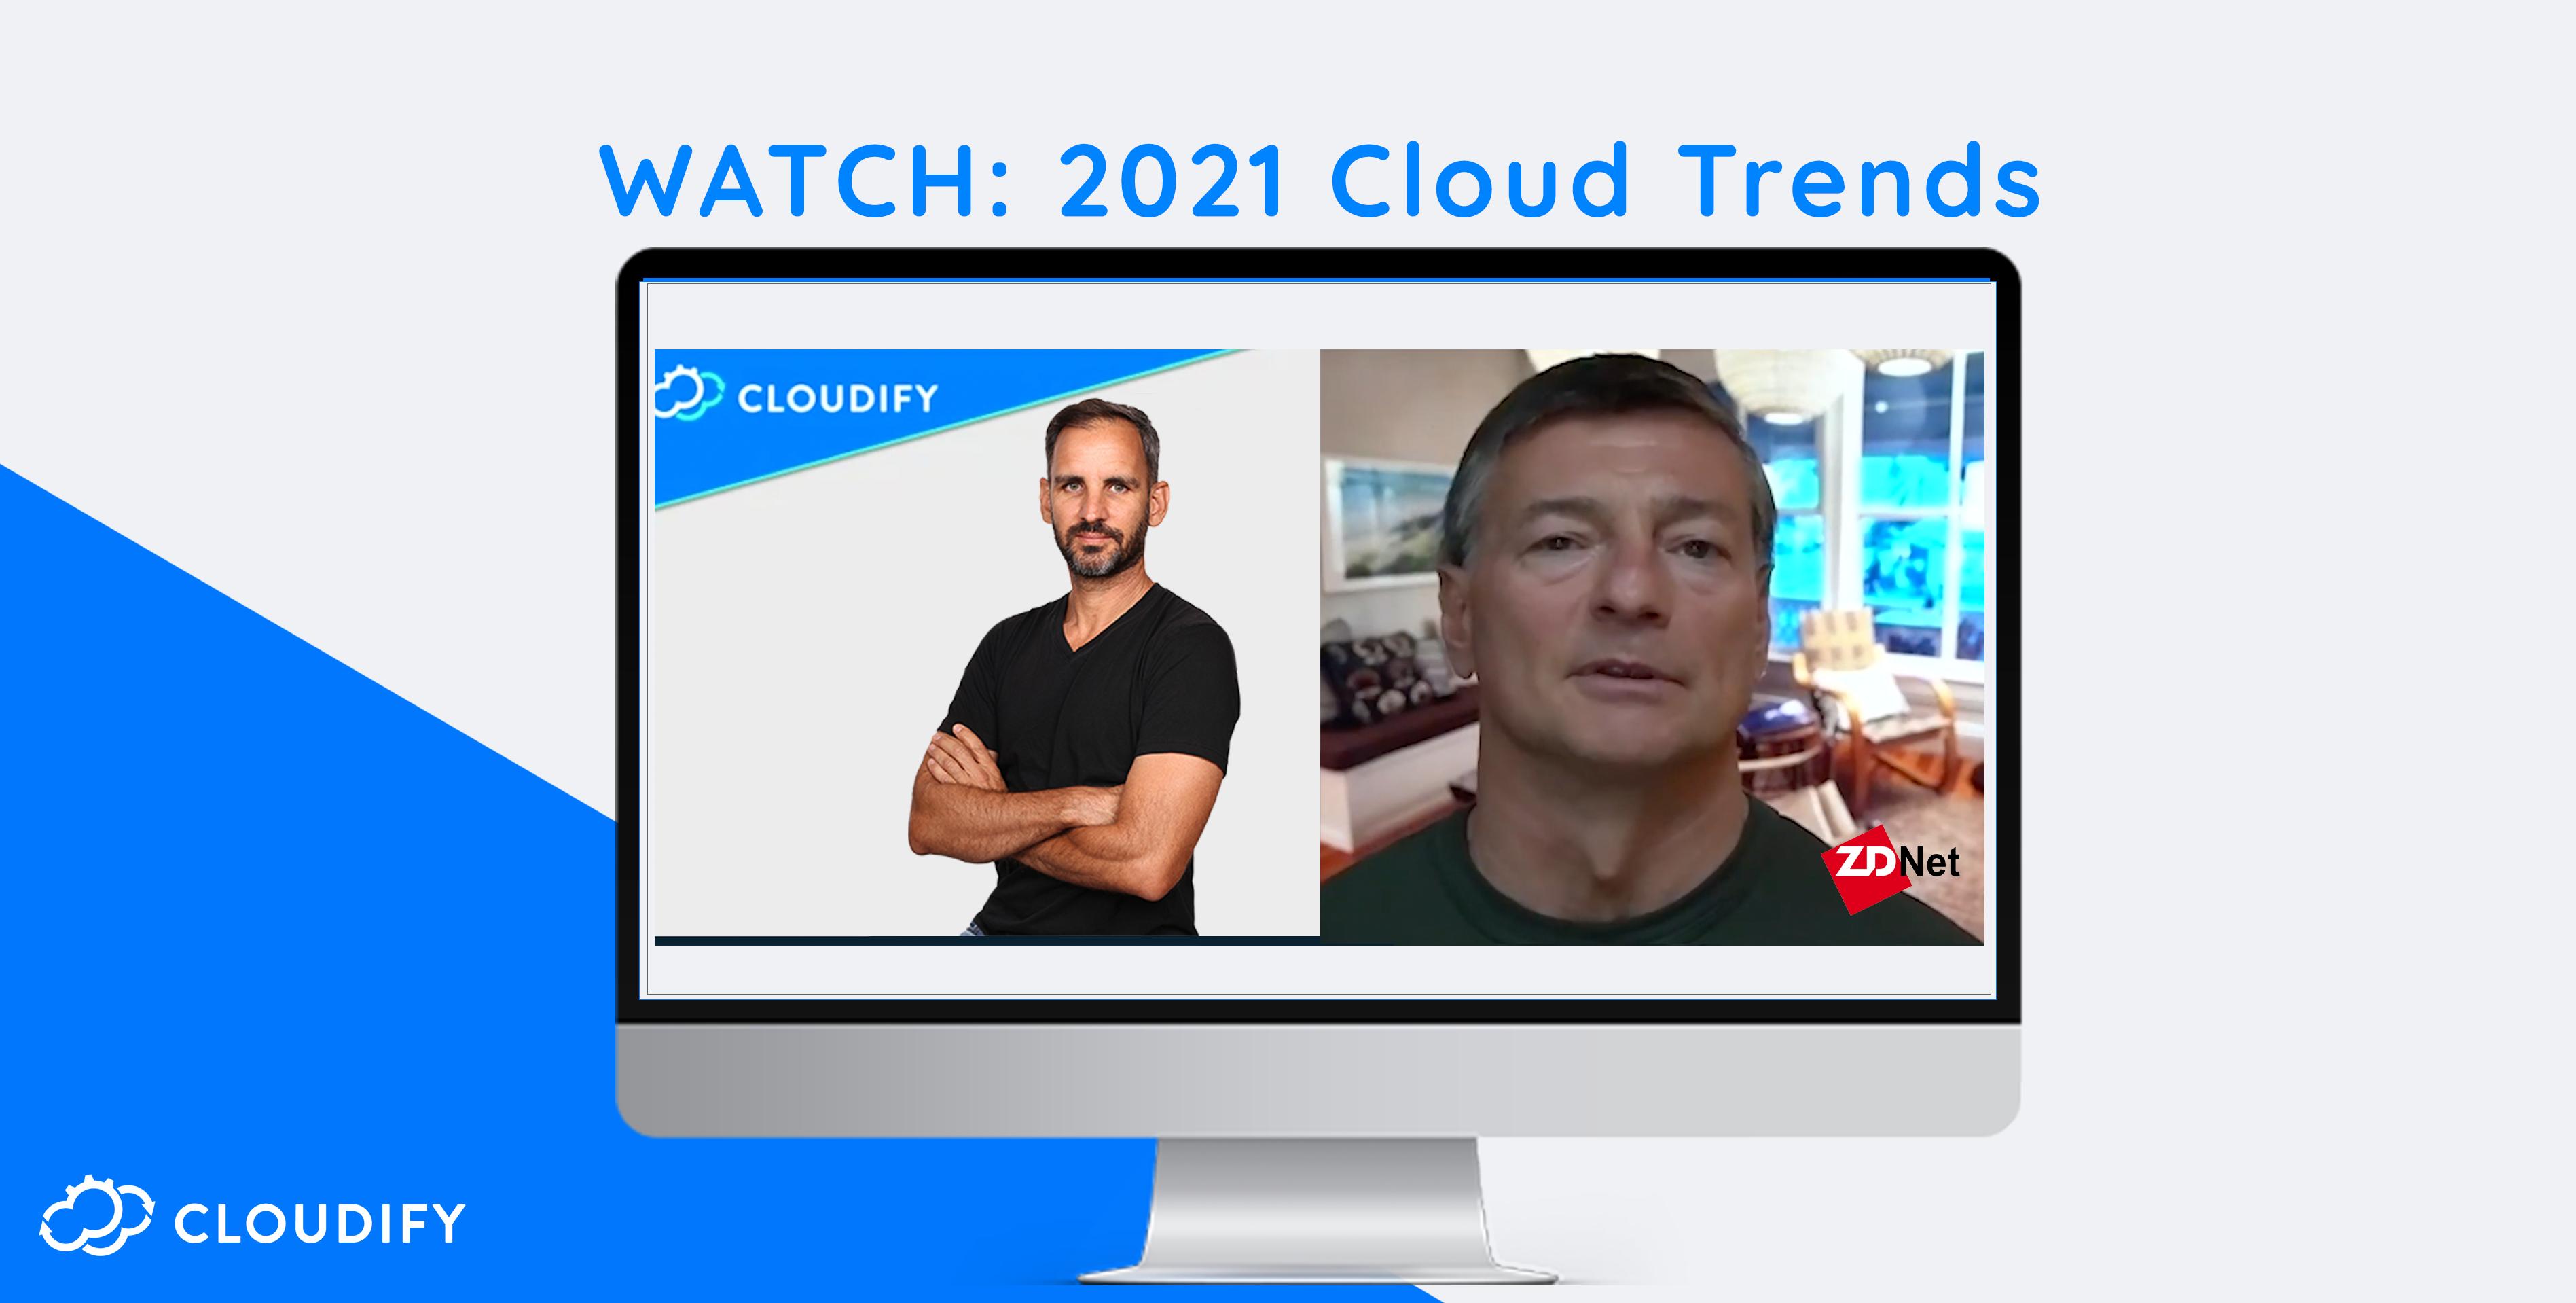 zdnre cloudify cloud trends 2021